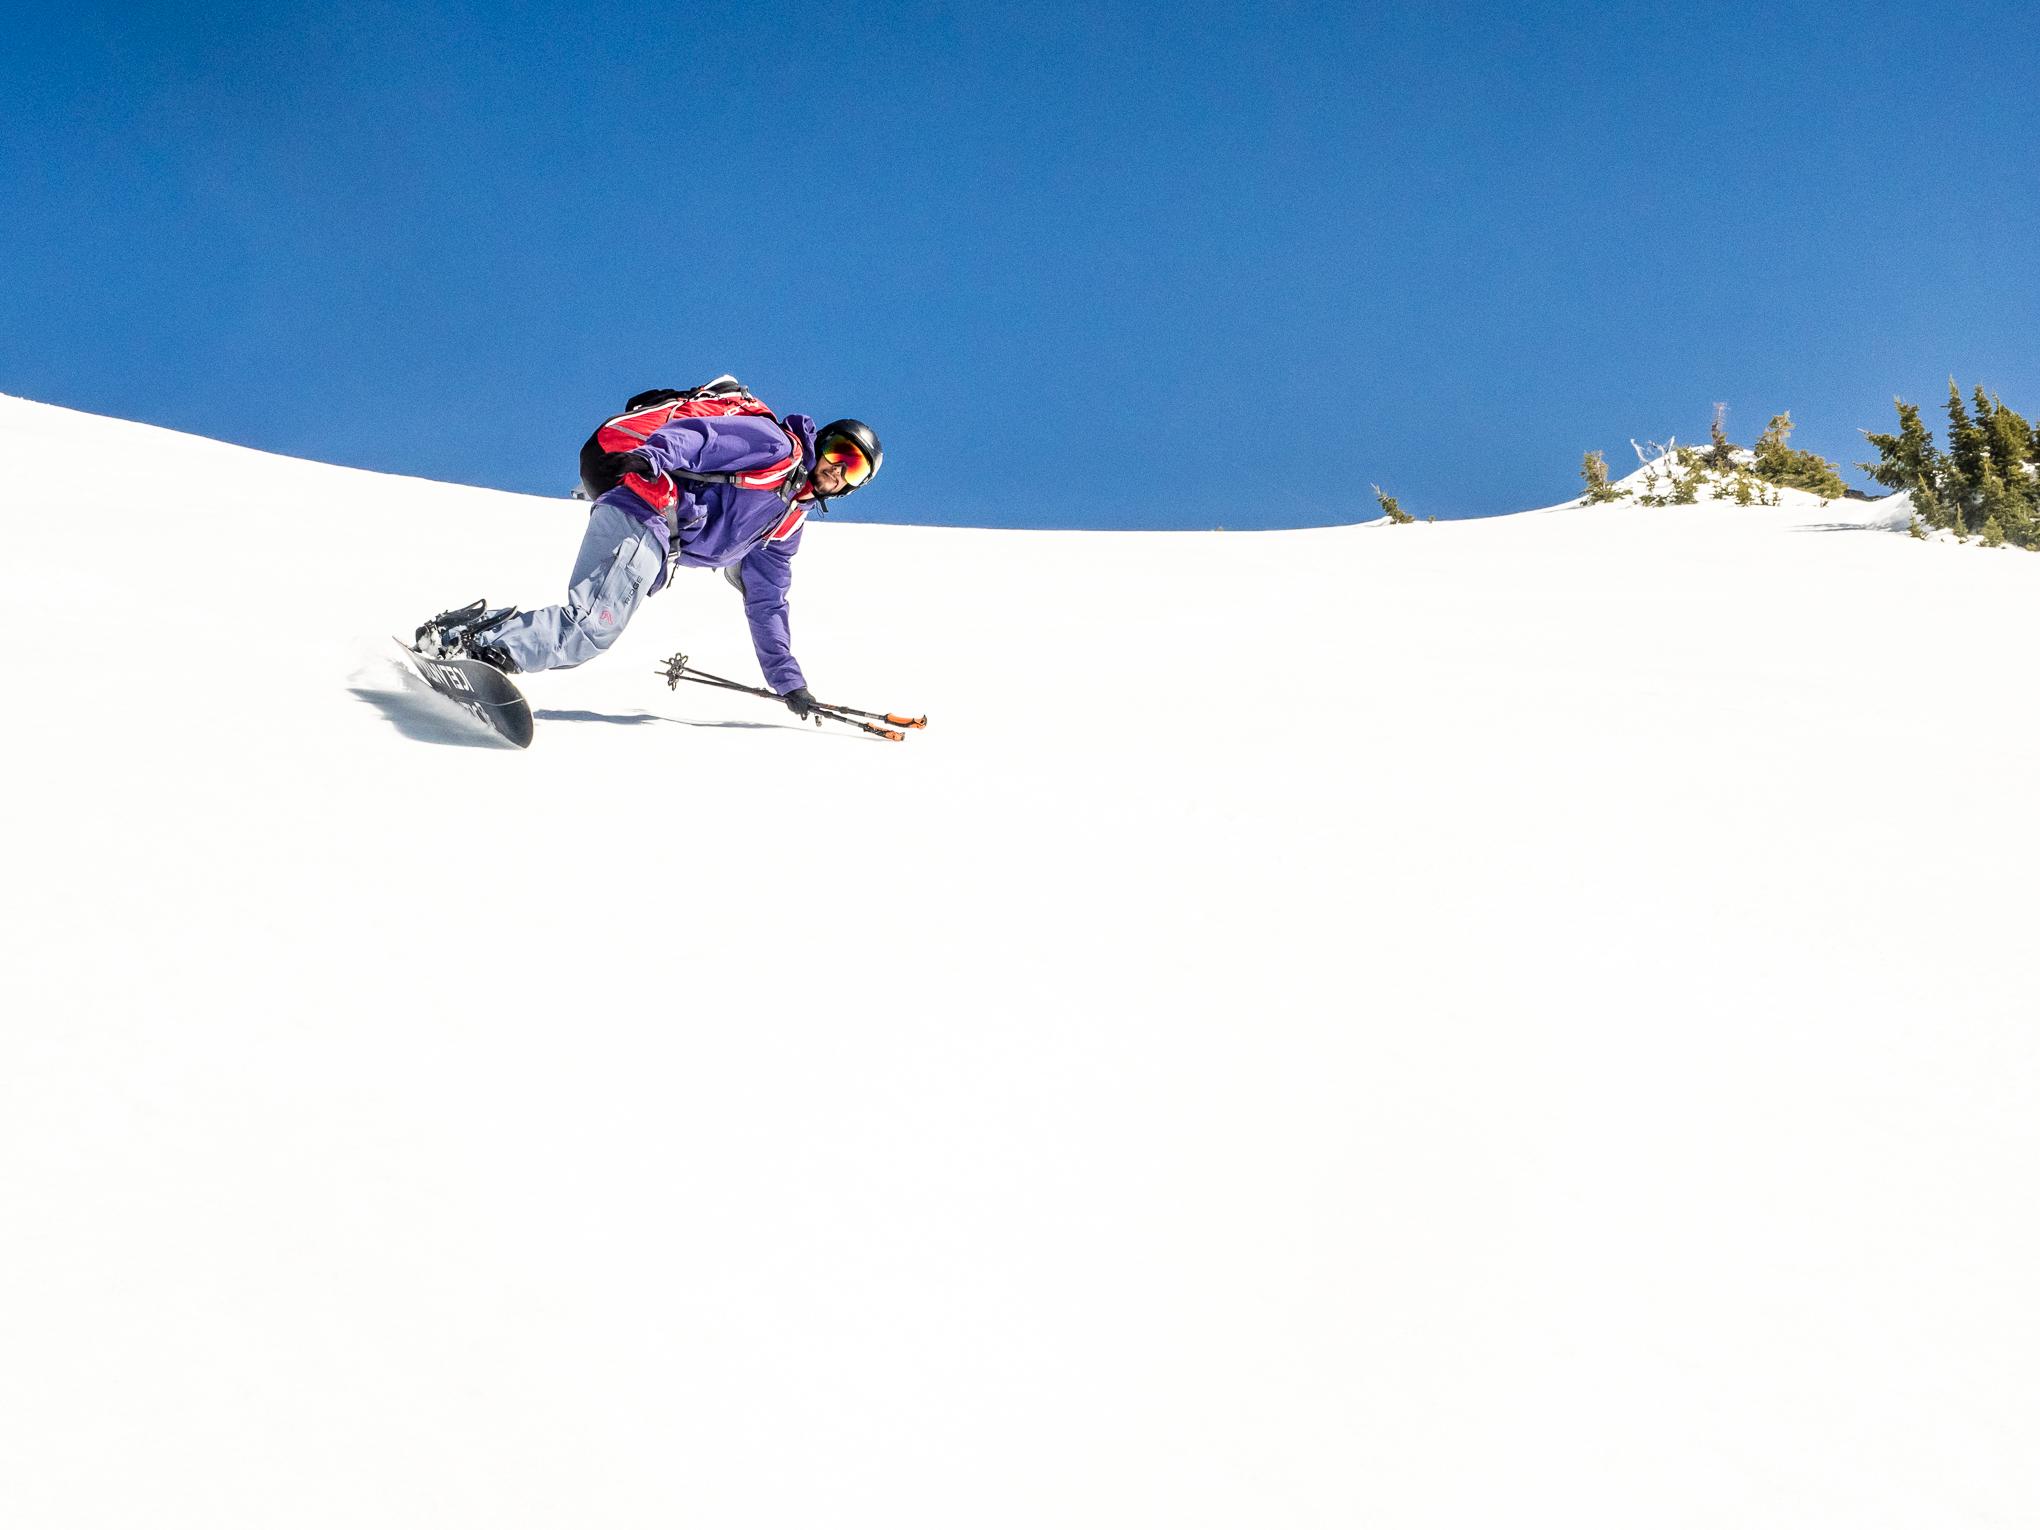 Snowboardinbg-RIDGE-Mountain-Academy-9.jpg